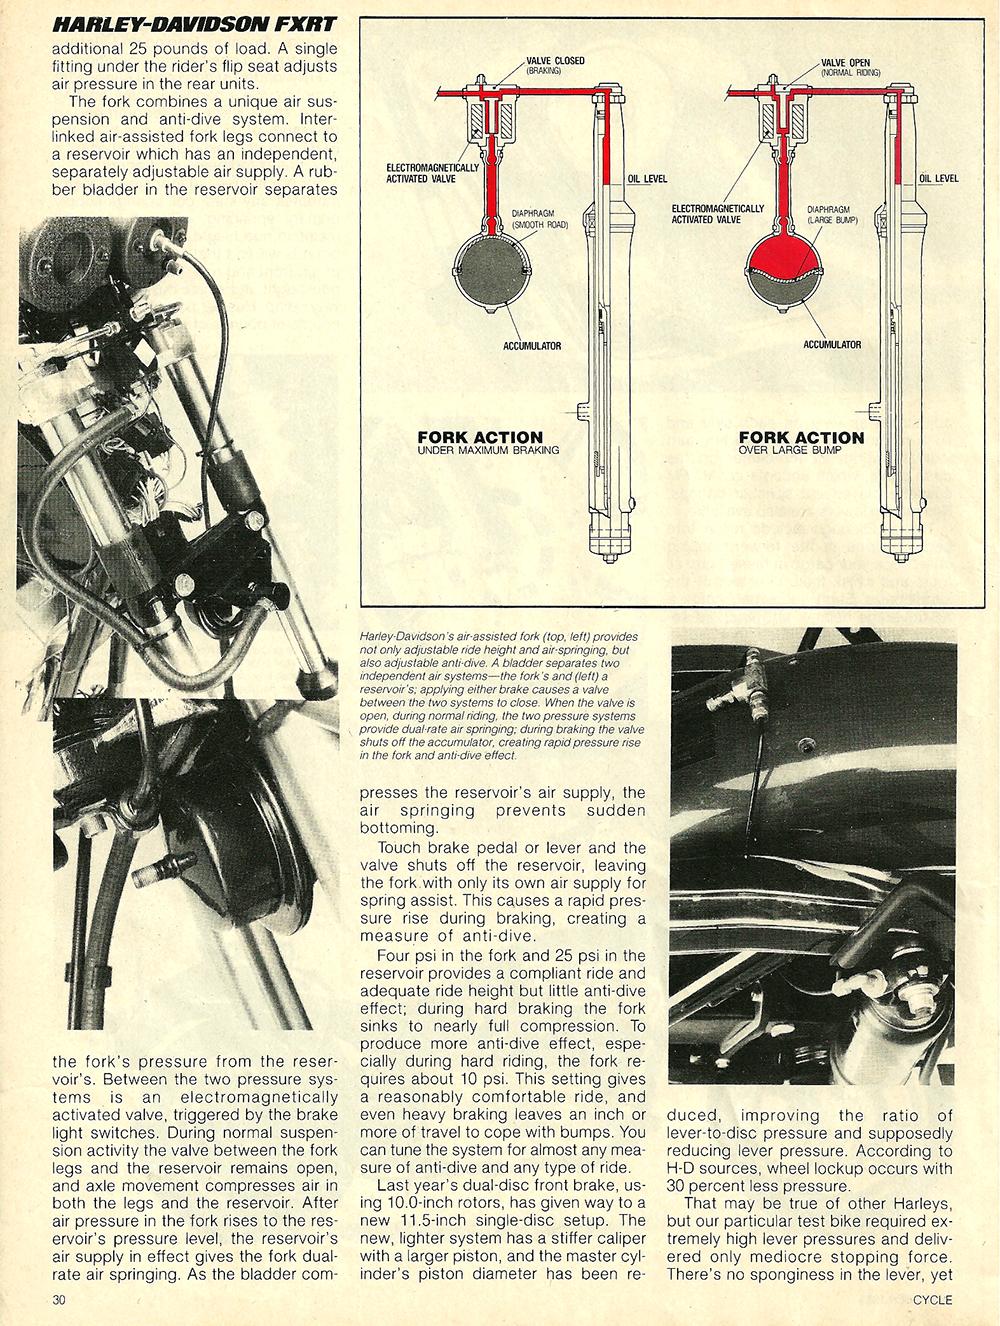 1983 Harley Davidson FXRT Sport Glide road test 7.jpg